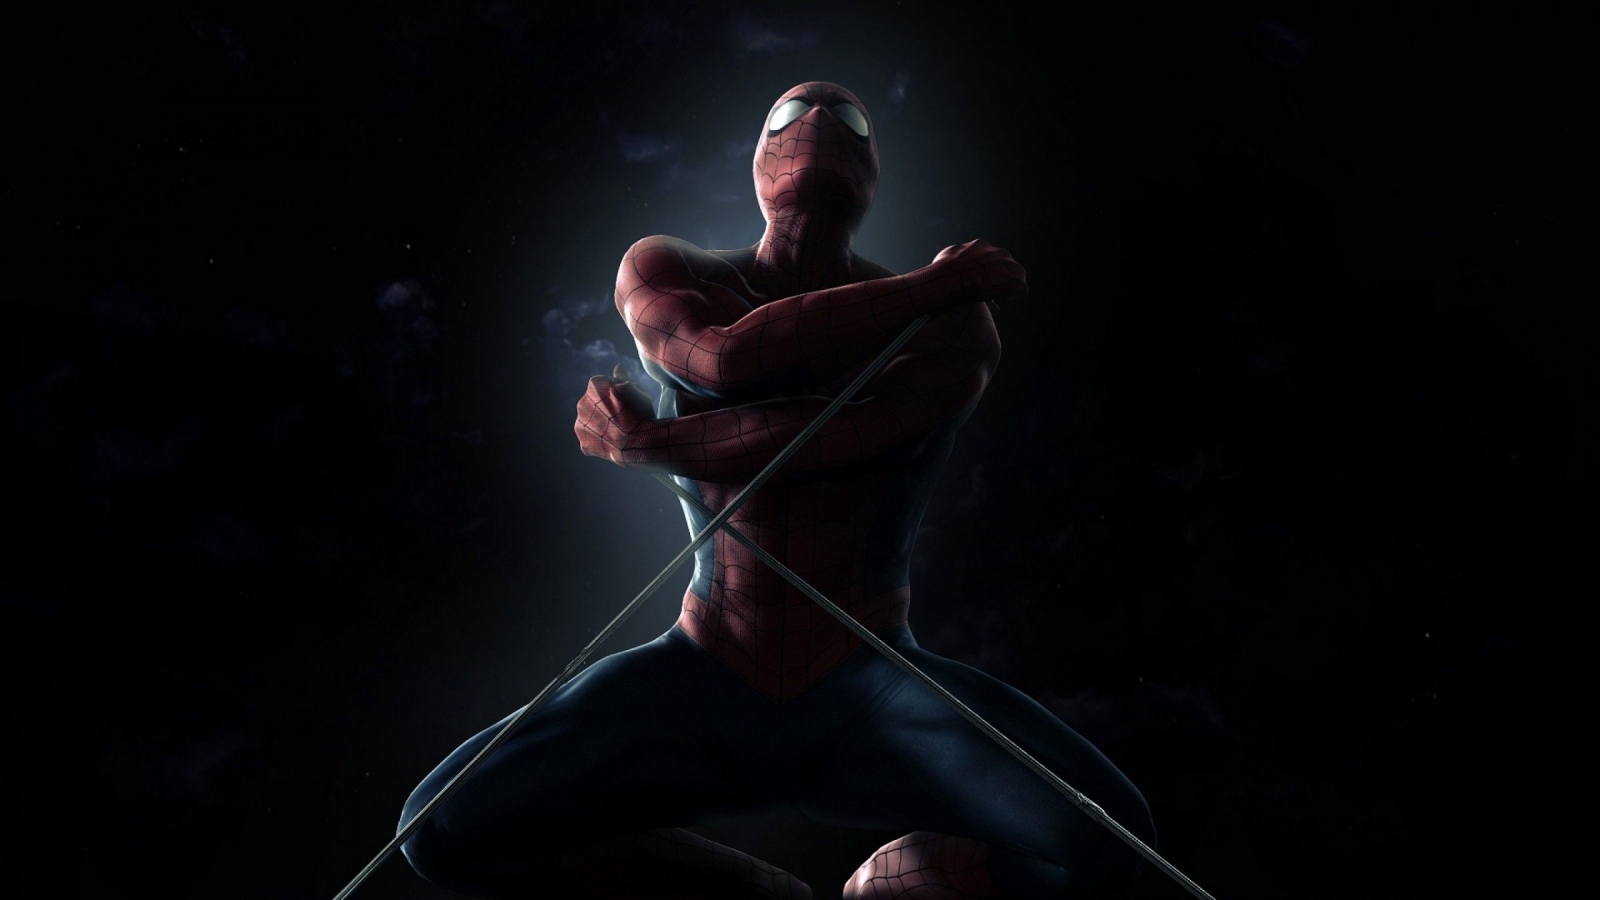 Spider-Man-Superheroes-1350x2400.jpg